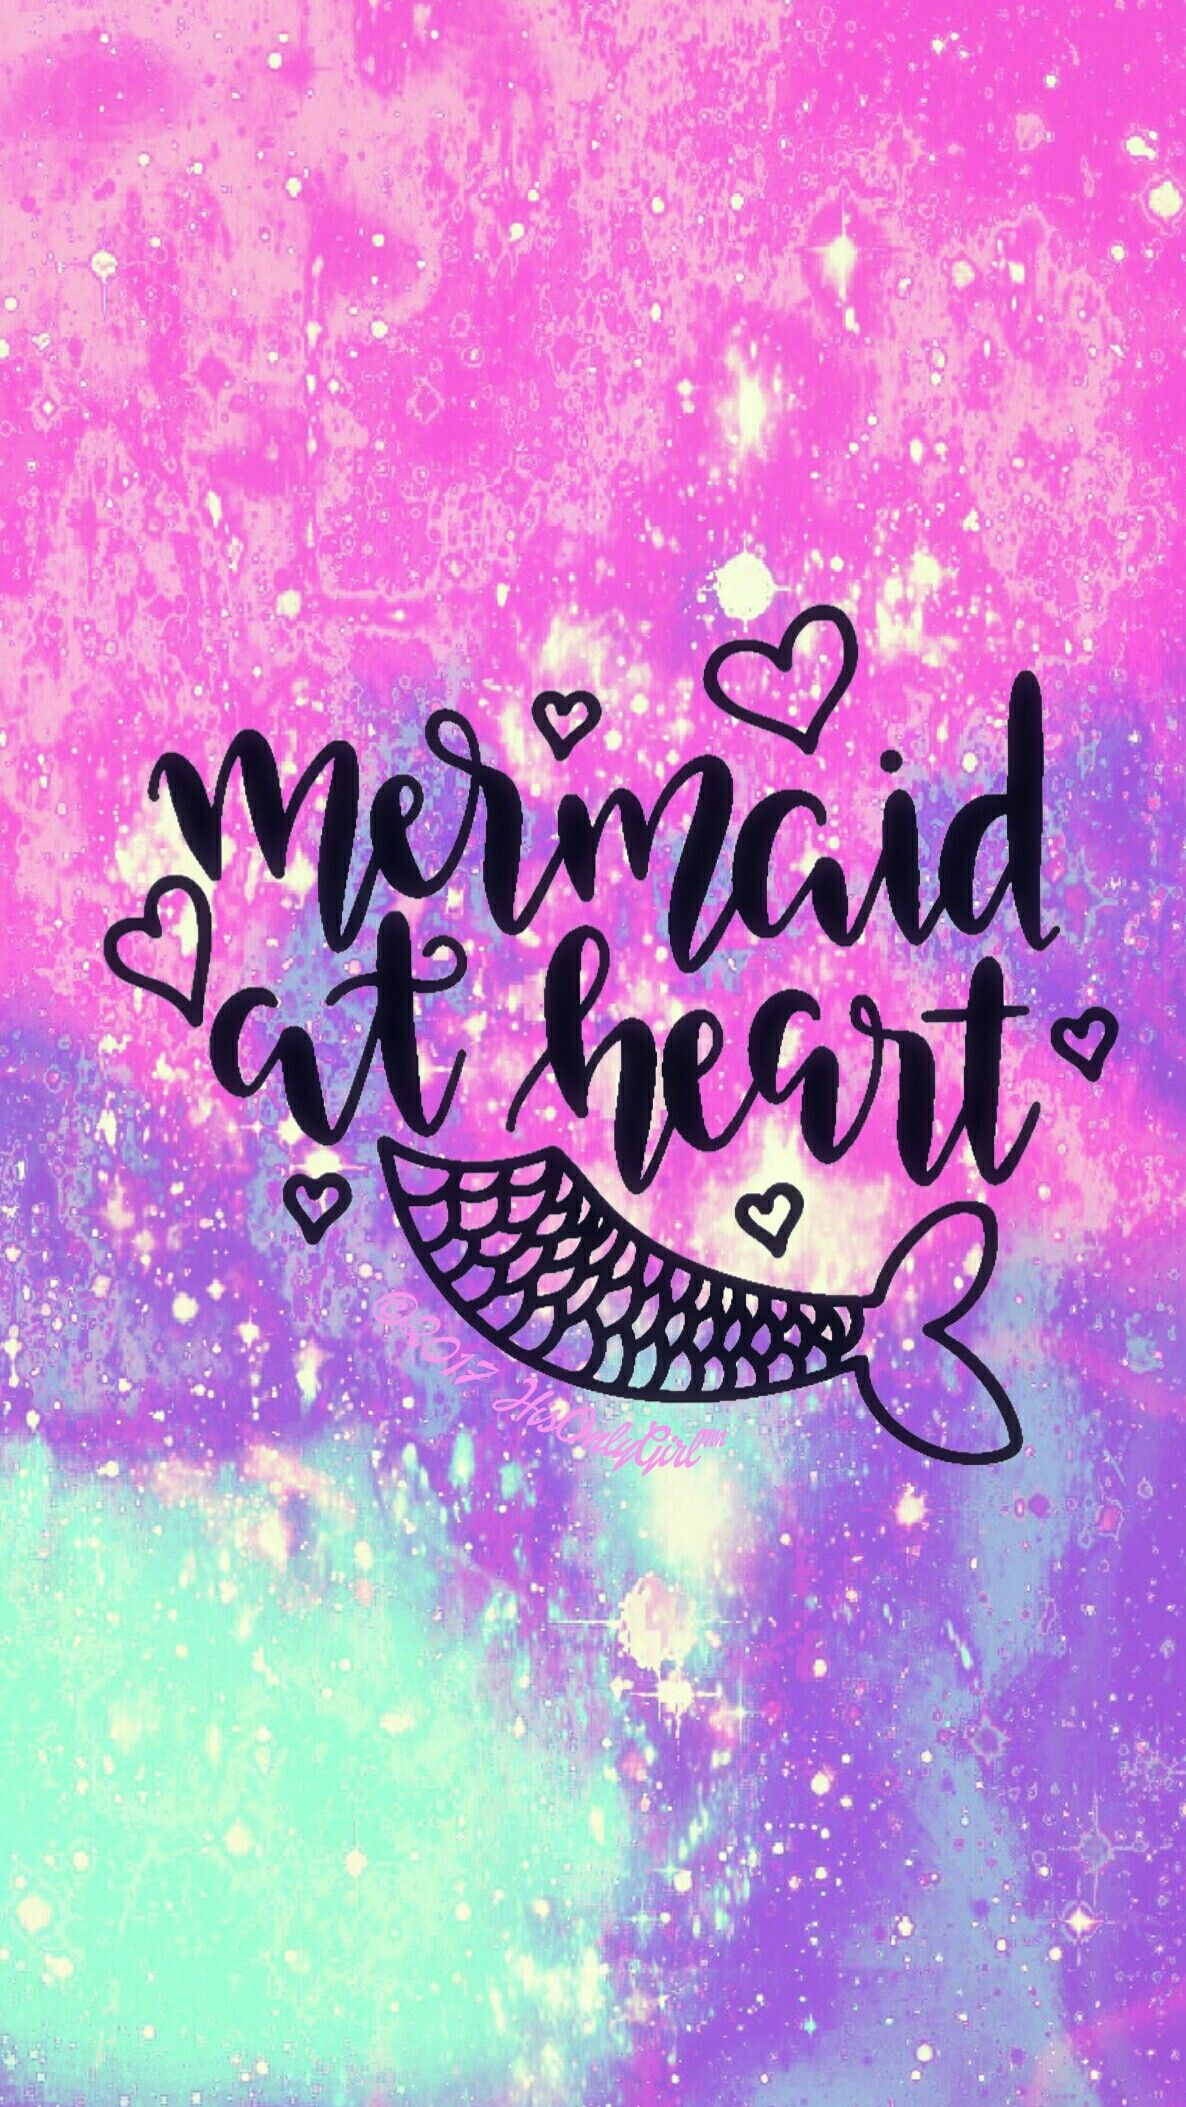 Mermaid galaxy wallpaper I created for the app CocoPPa ...